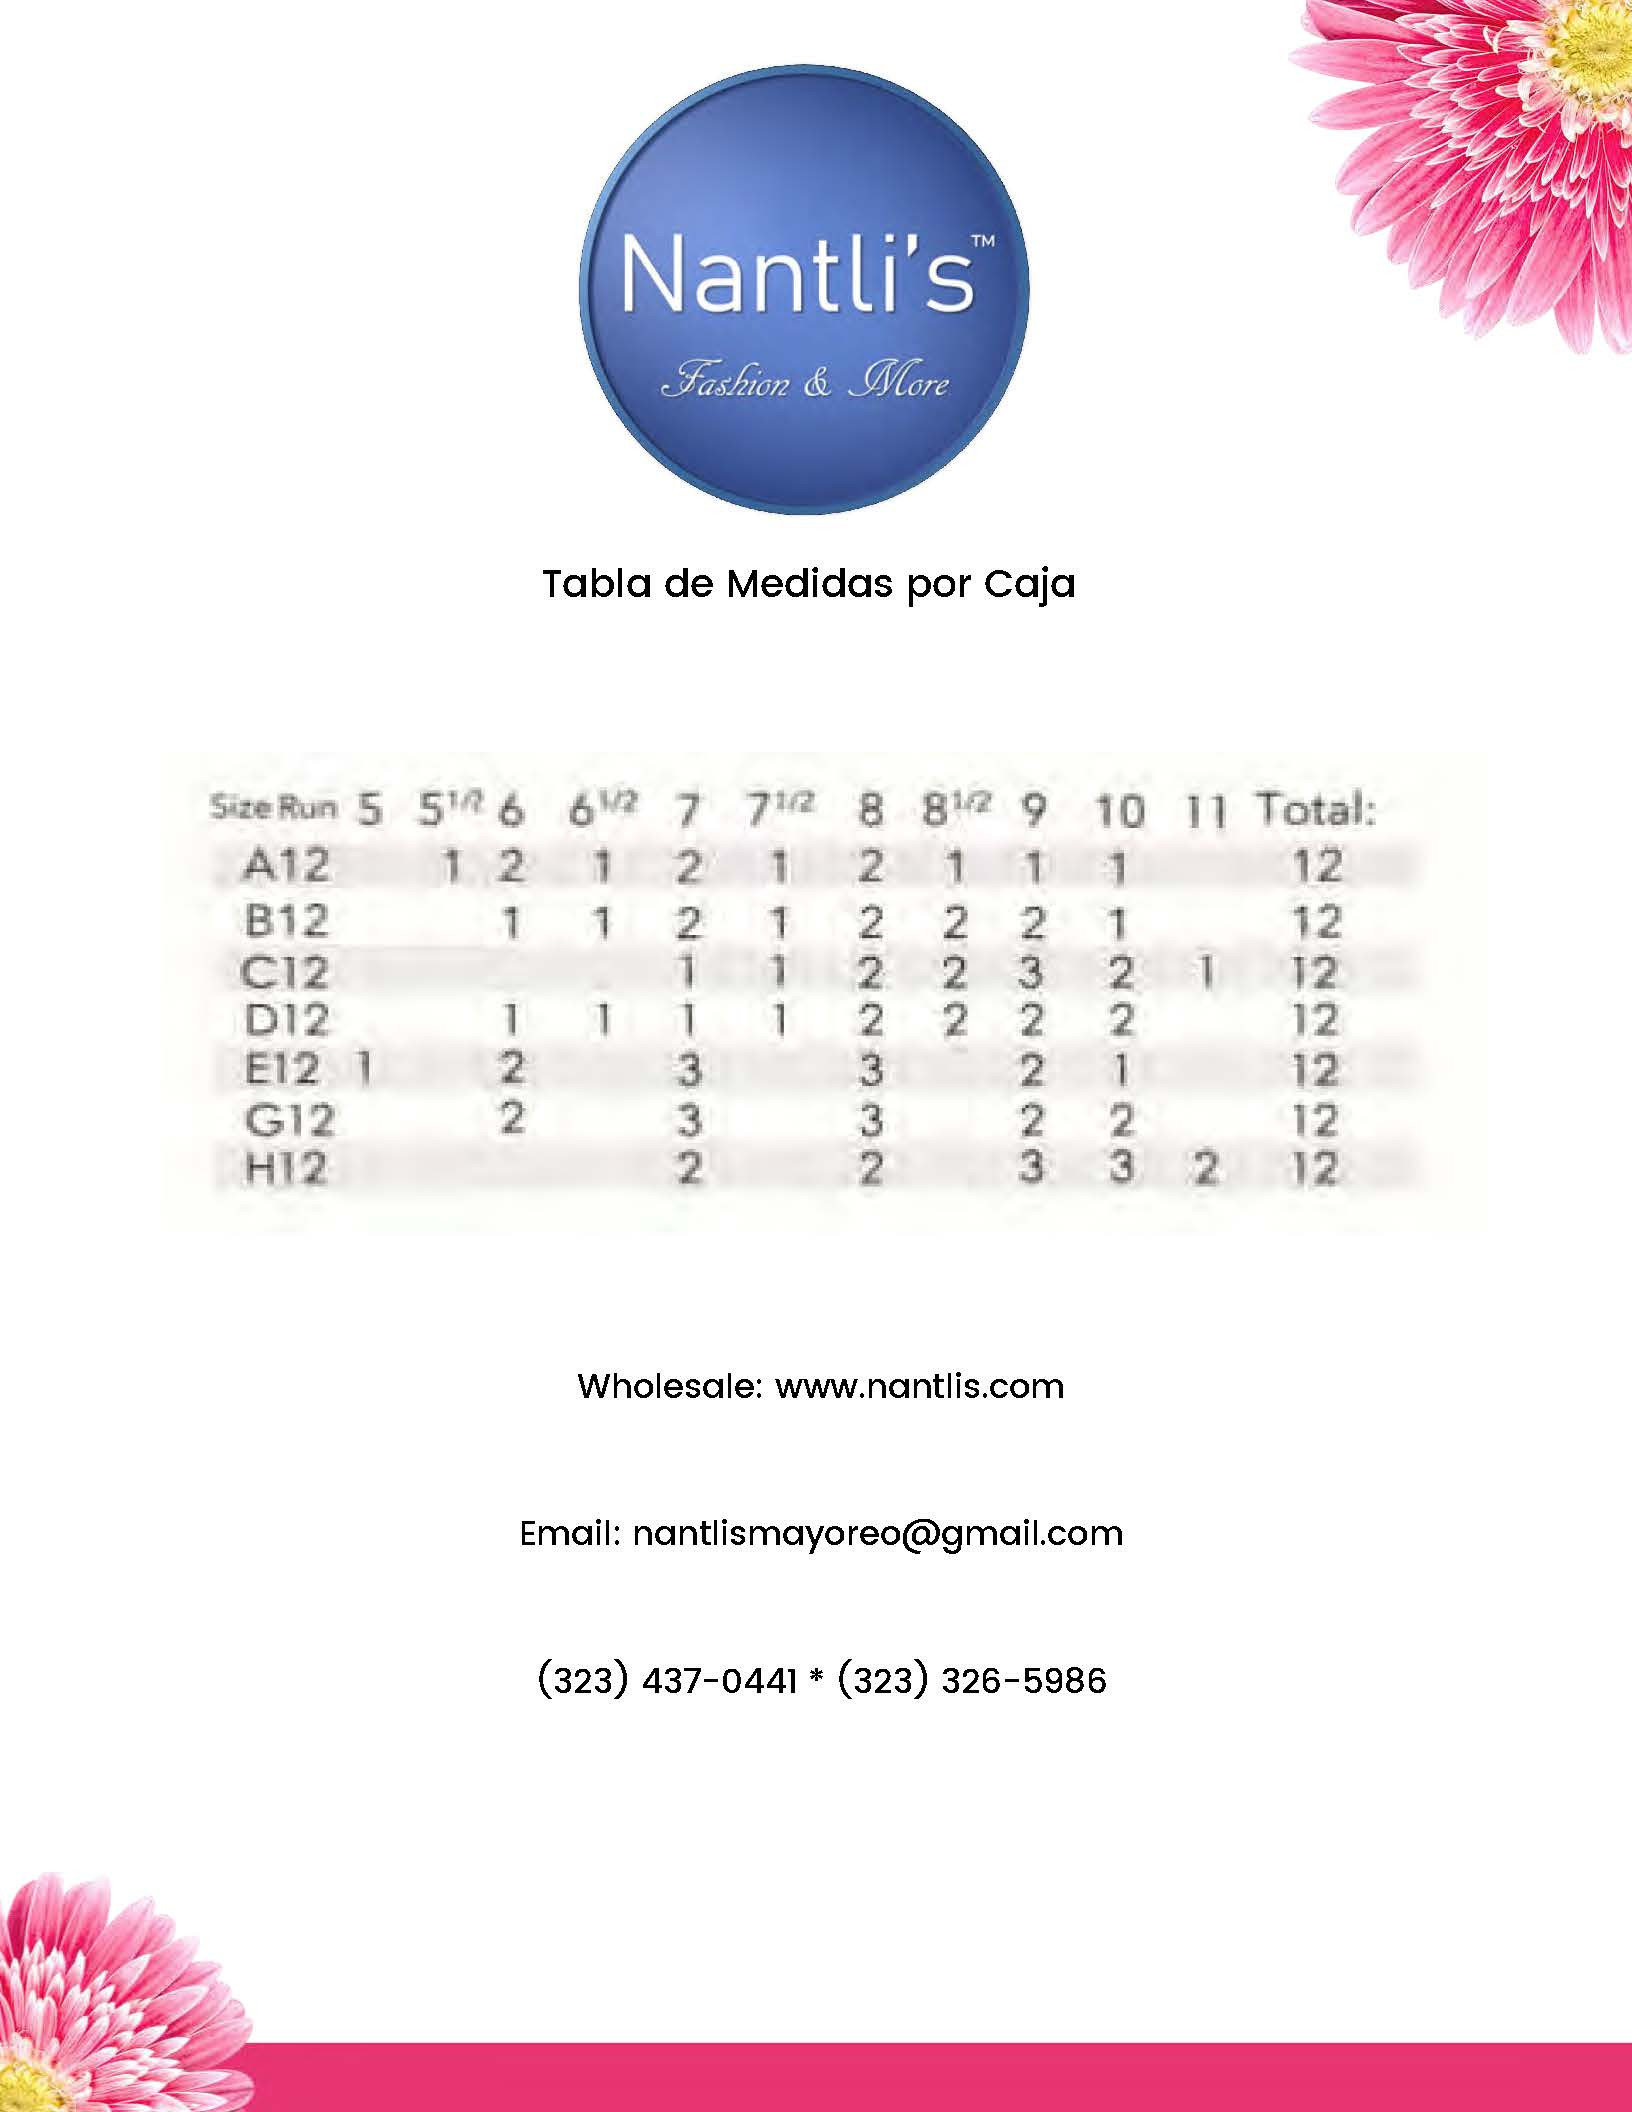 Nantlis Vol QU43 Zapatos para mujer mayoreo Wholesale shoes for women_Page_26